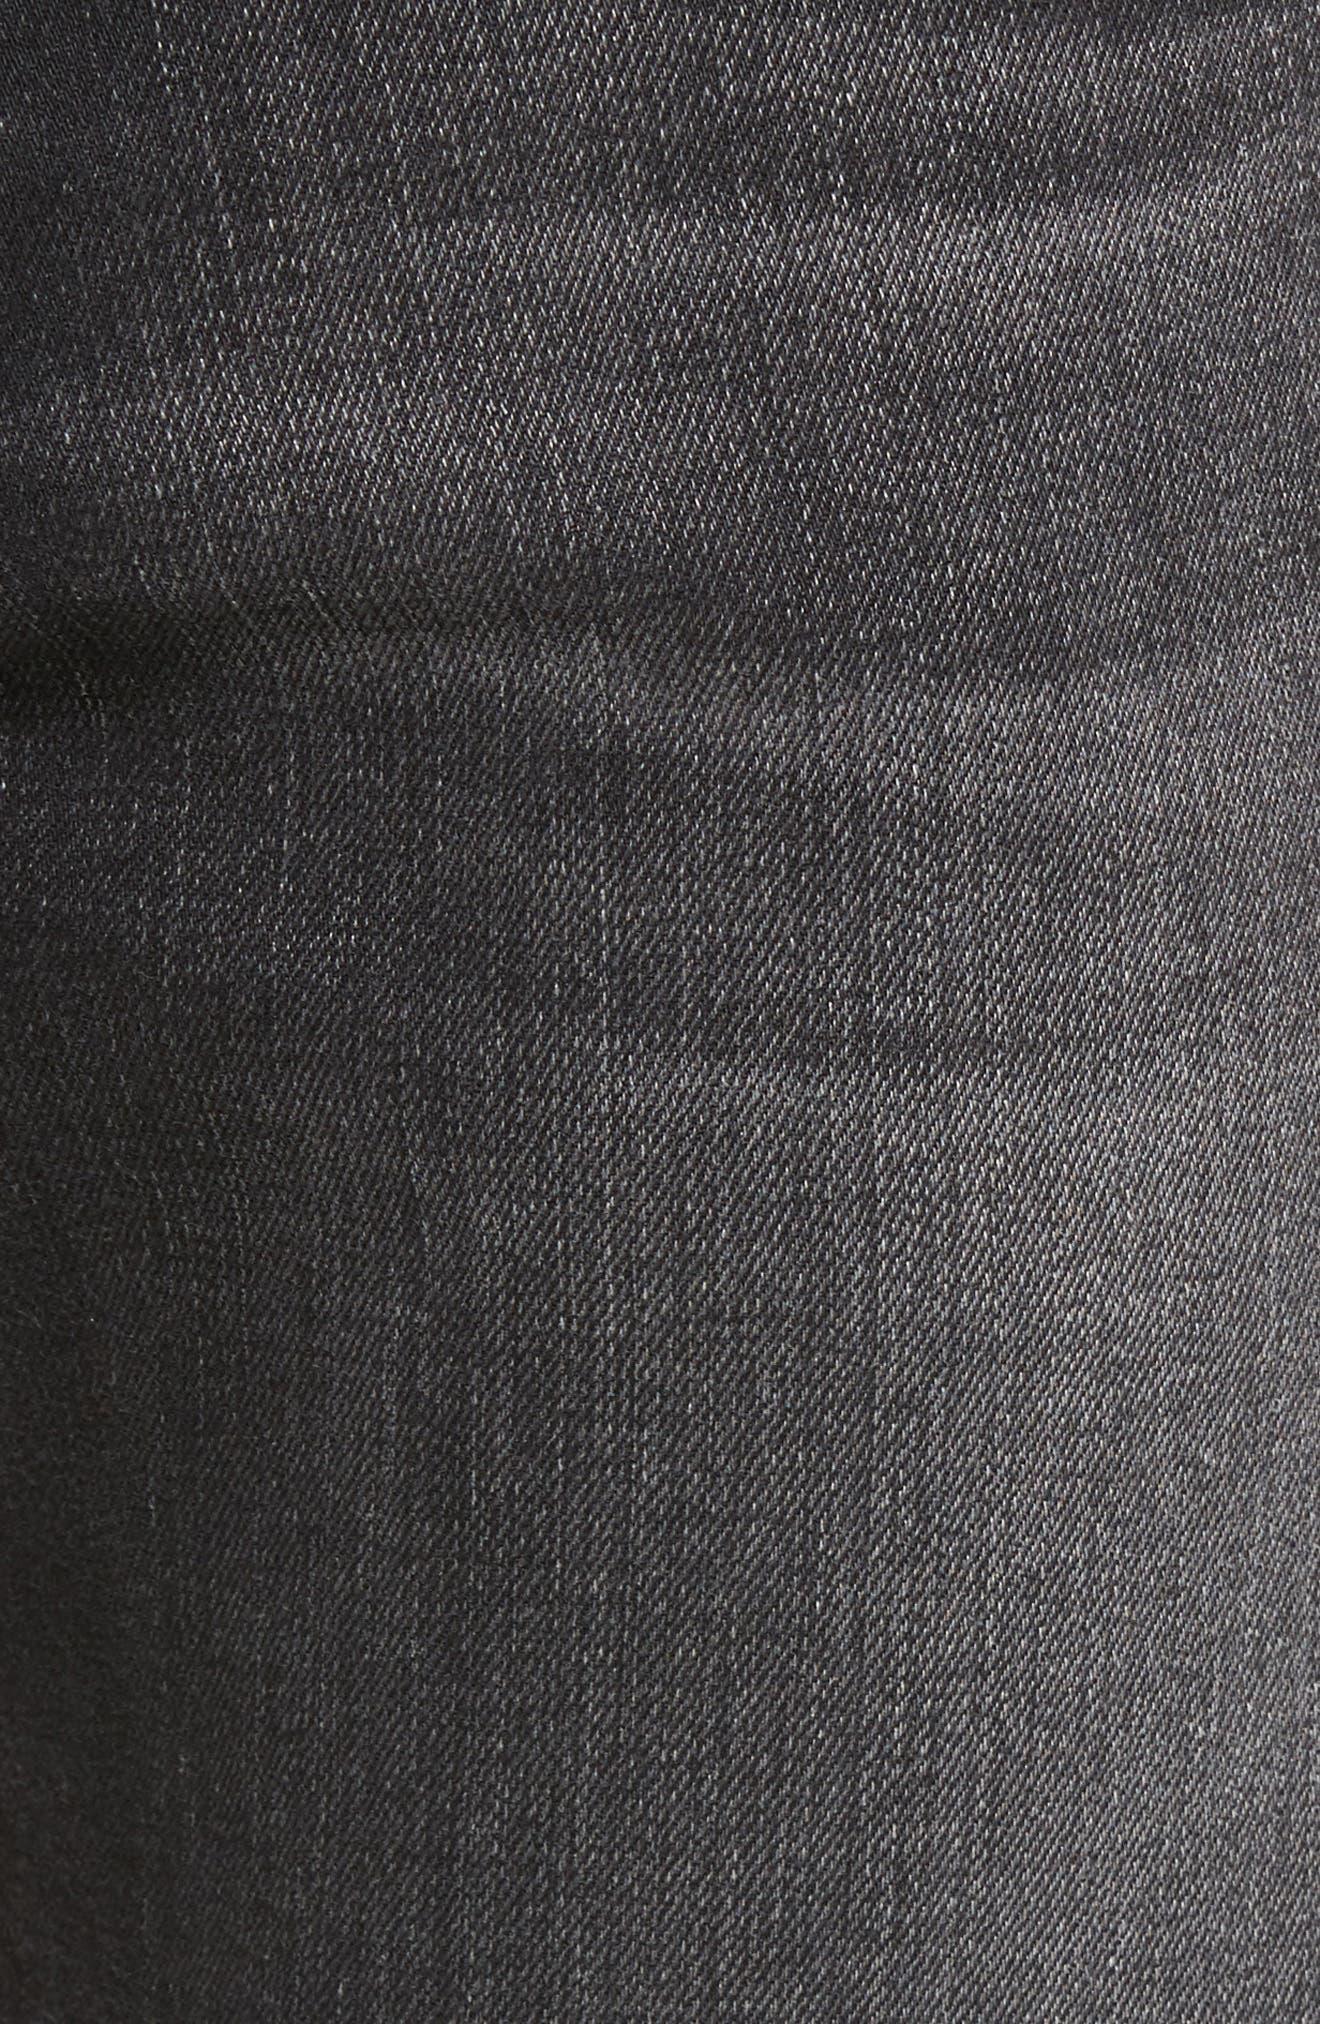 Tellis Modern Slim Fit Jeans,                             Alternate thumbnail 5, color,                             019